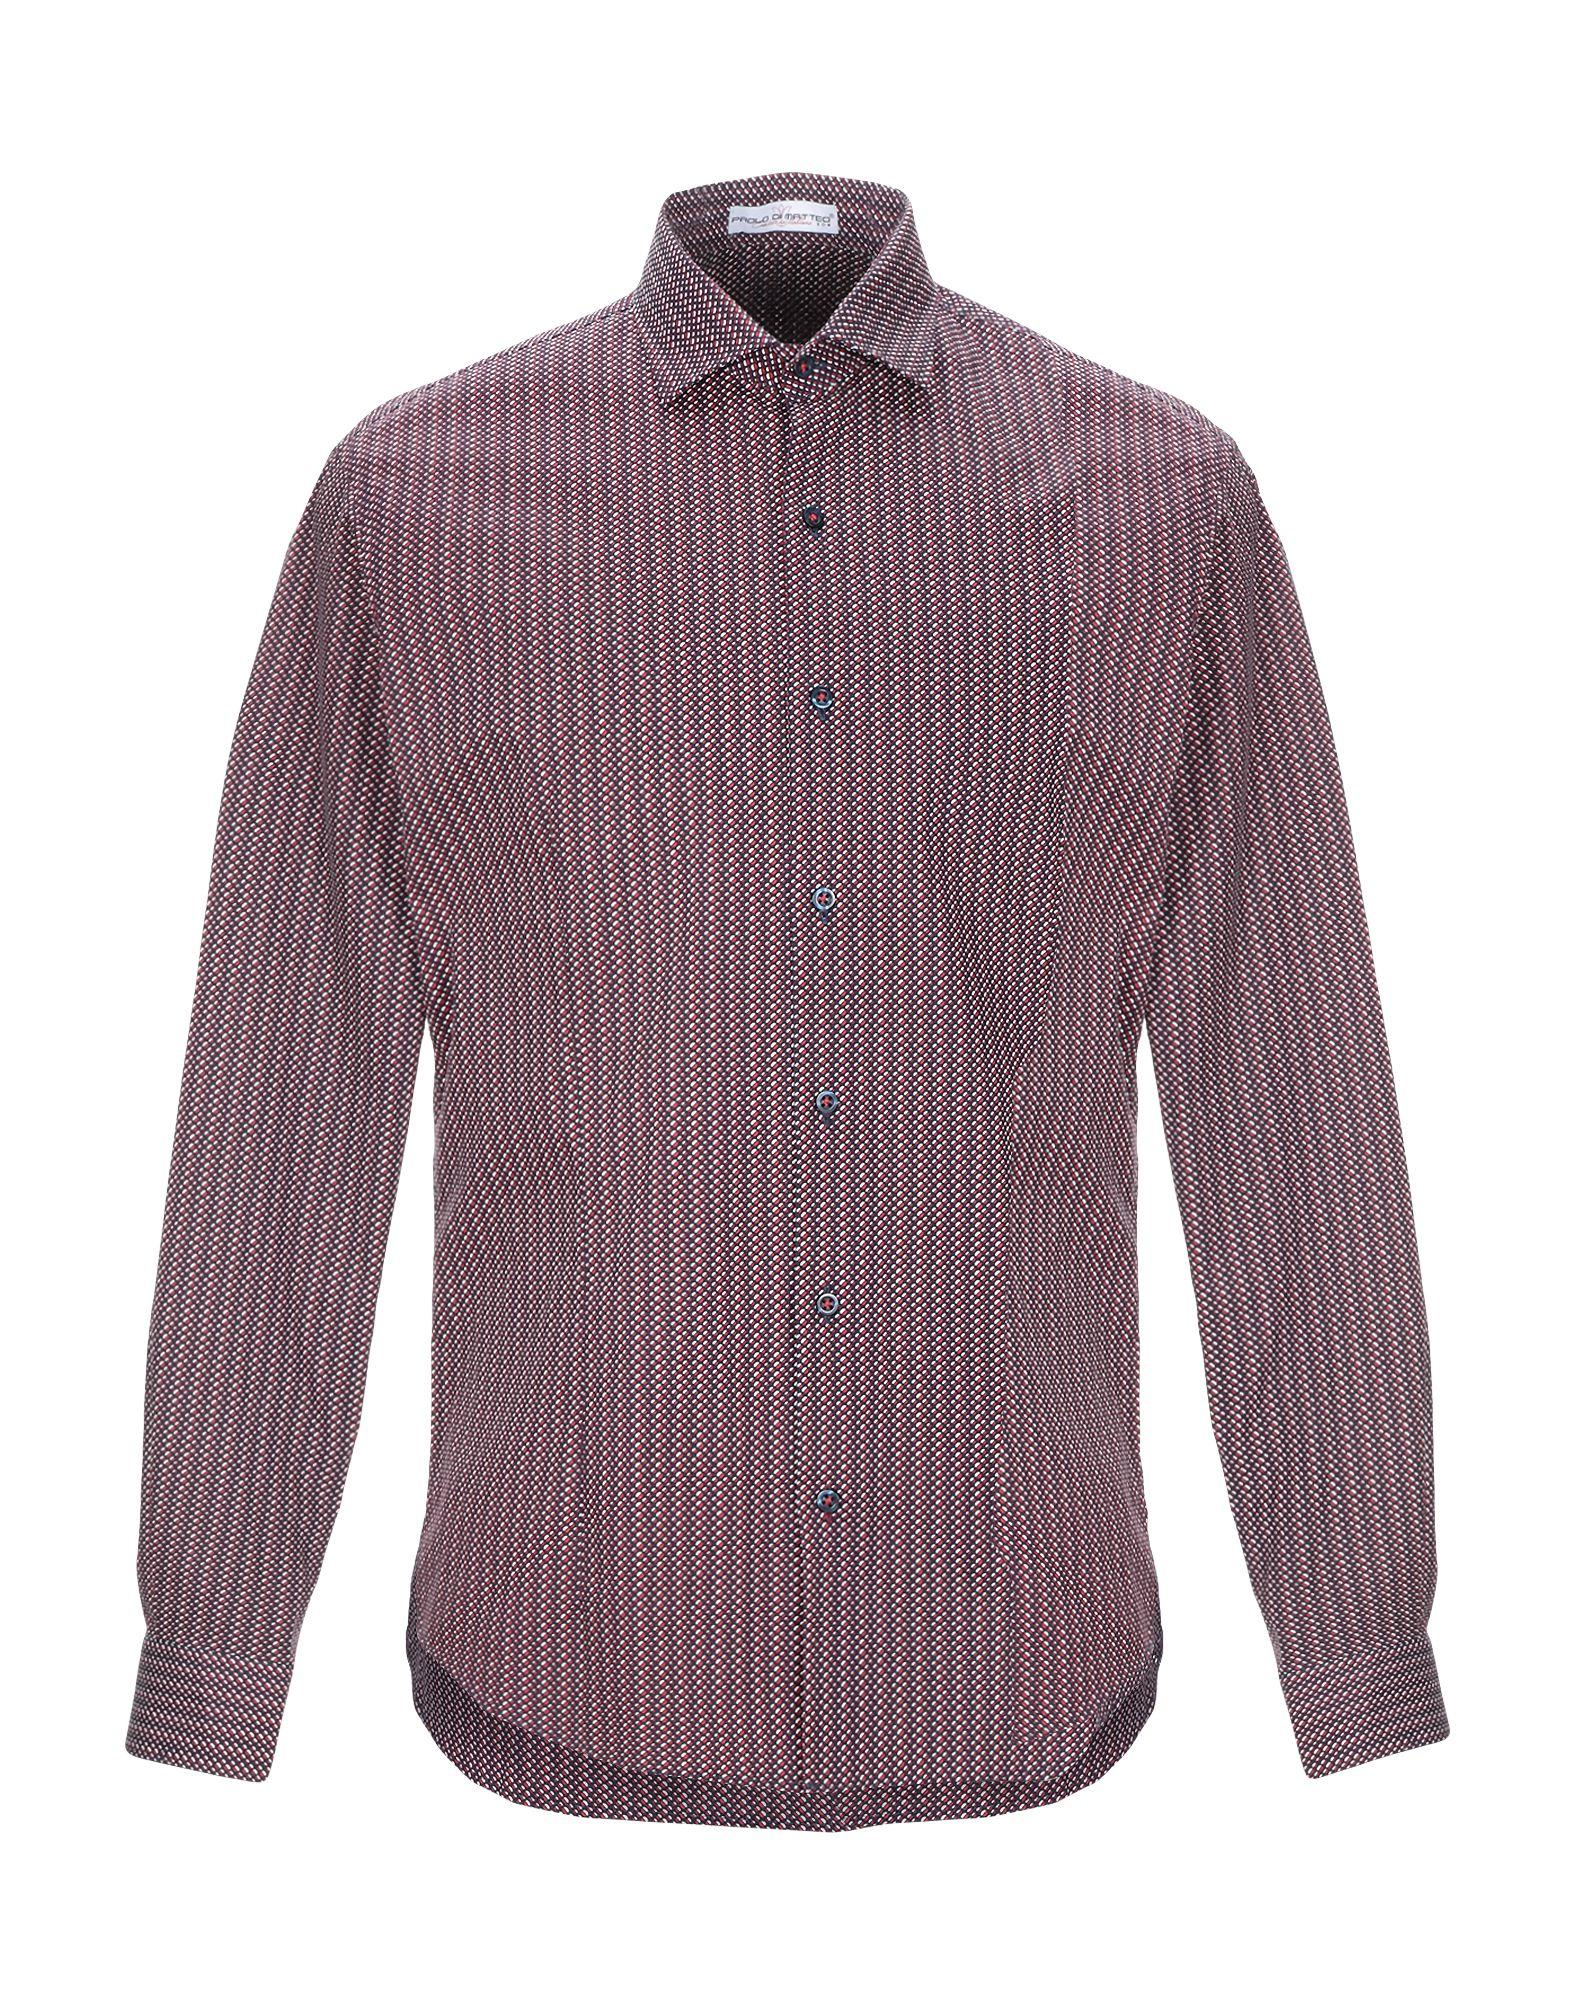 PAOLO DI MATTEO Pубашка mario matteo пиджак